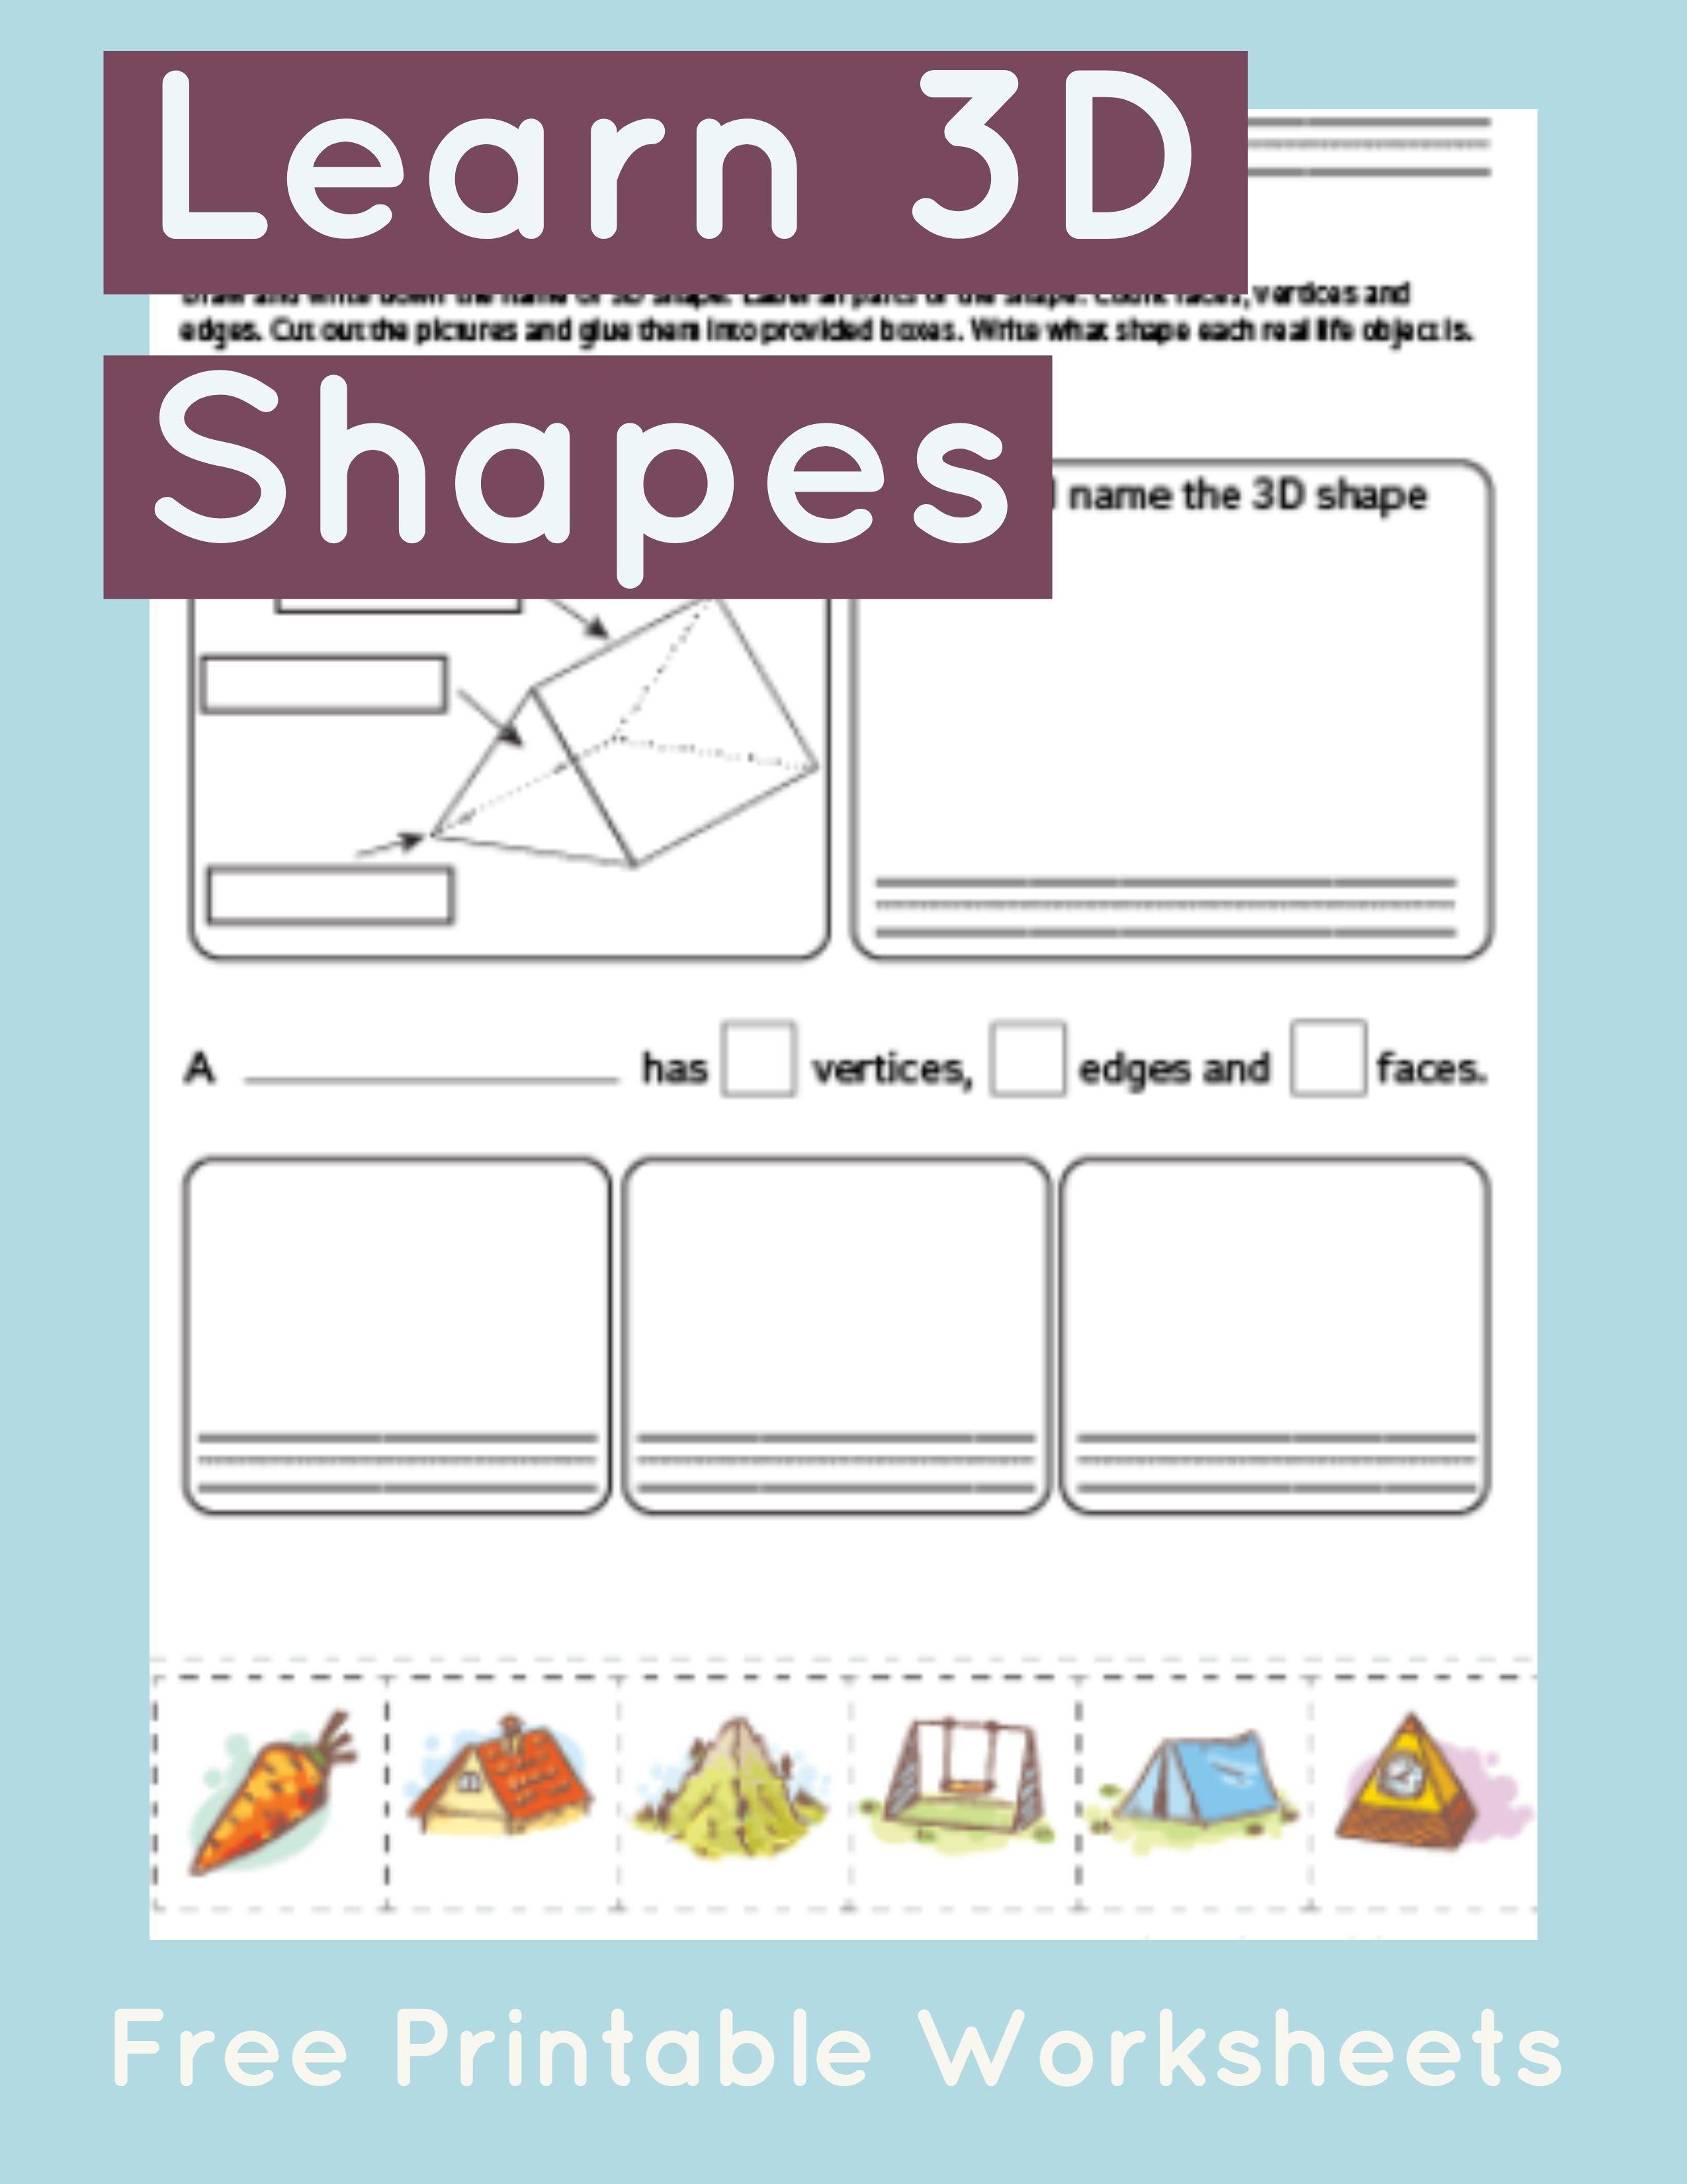 Triangular Prism Worksheet Primarylearning Org Shapes Worksheet Kindergarten Math Worksheets Free Math